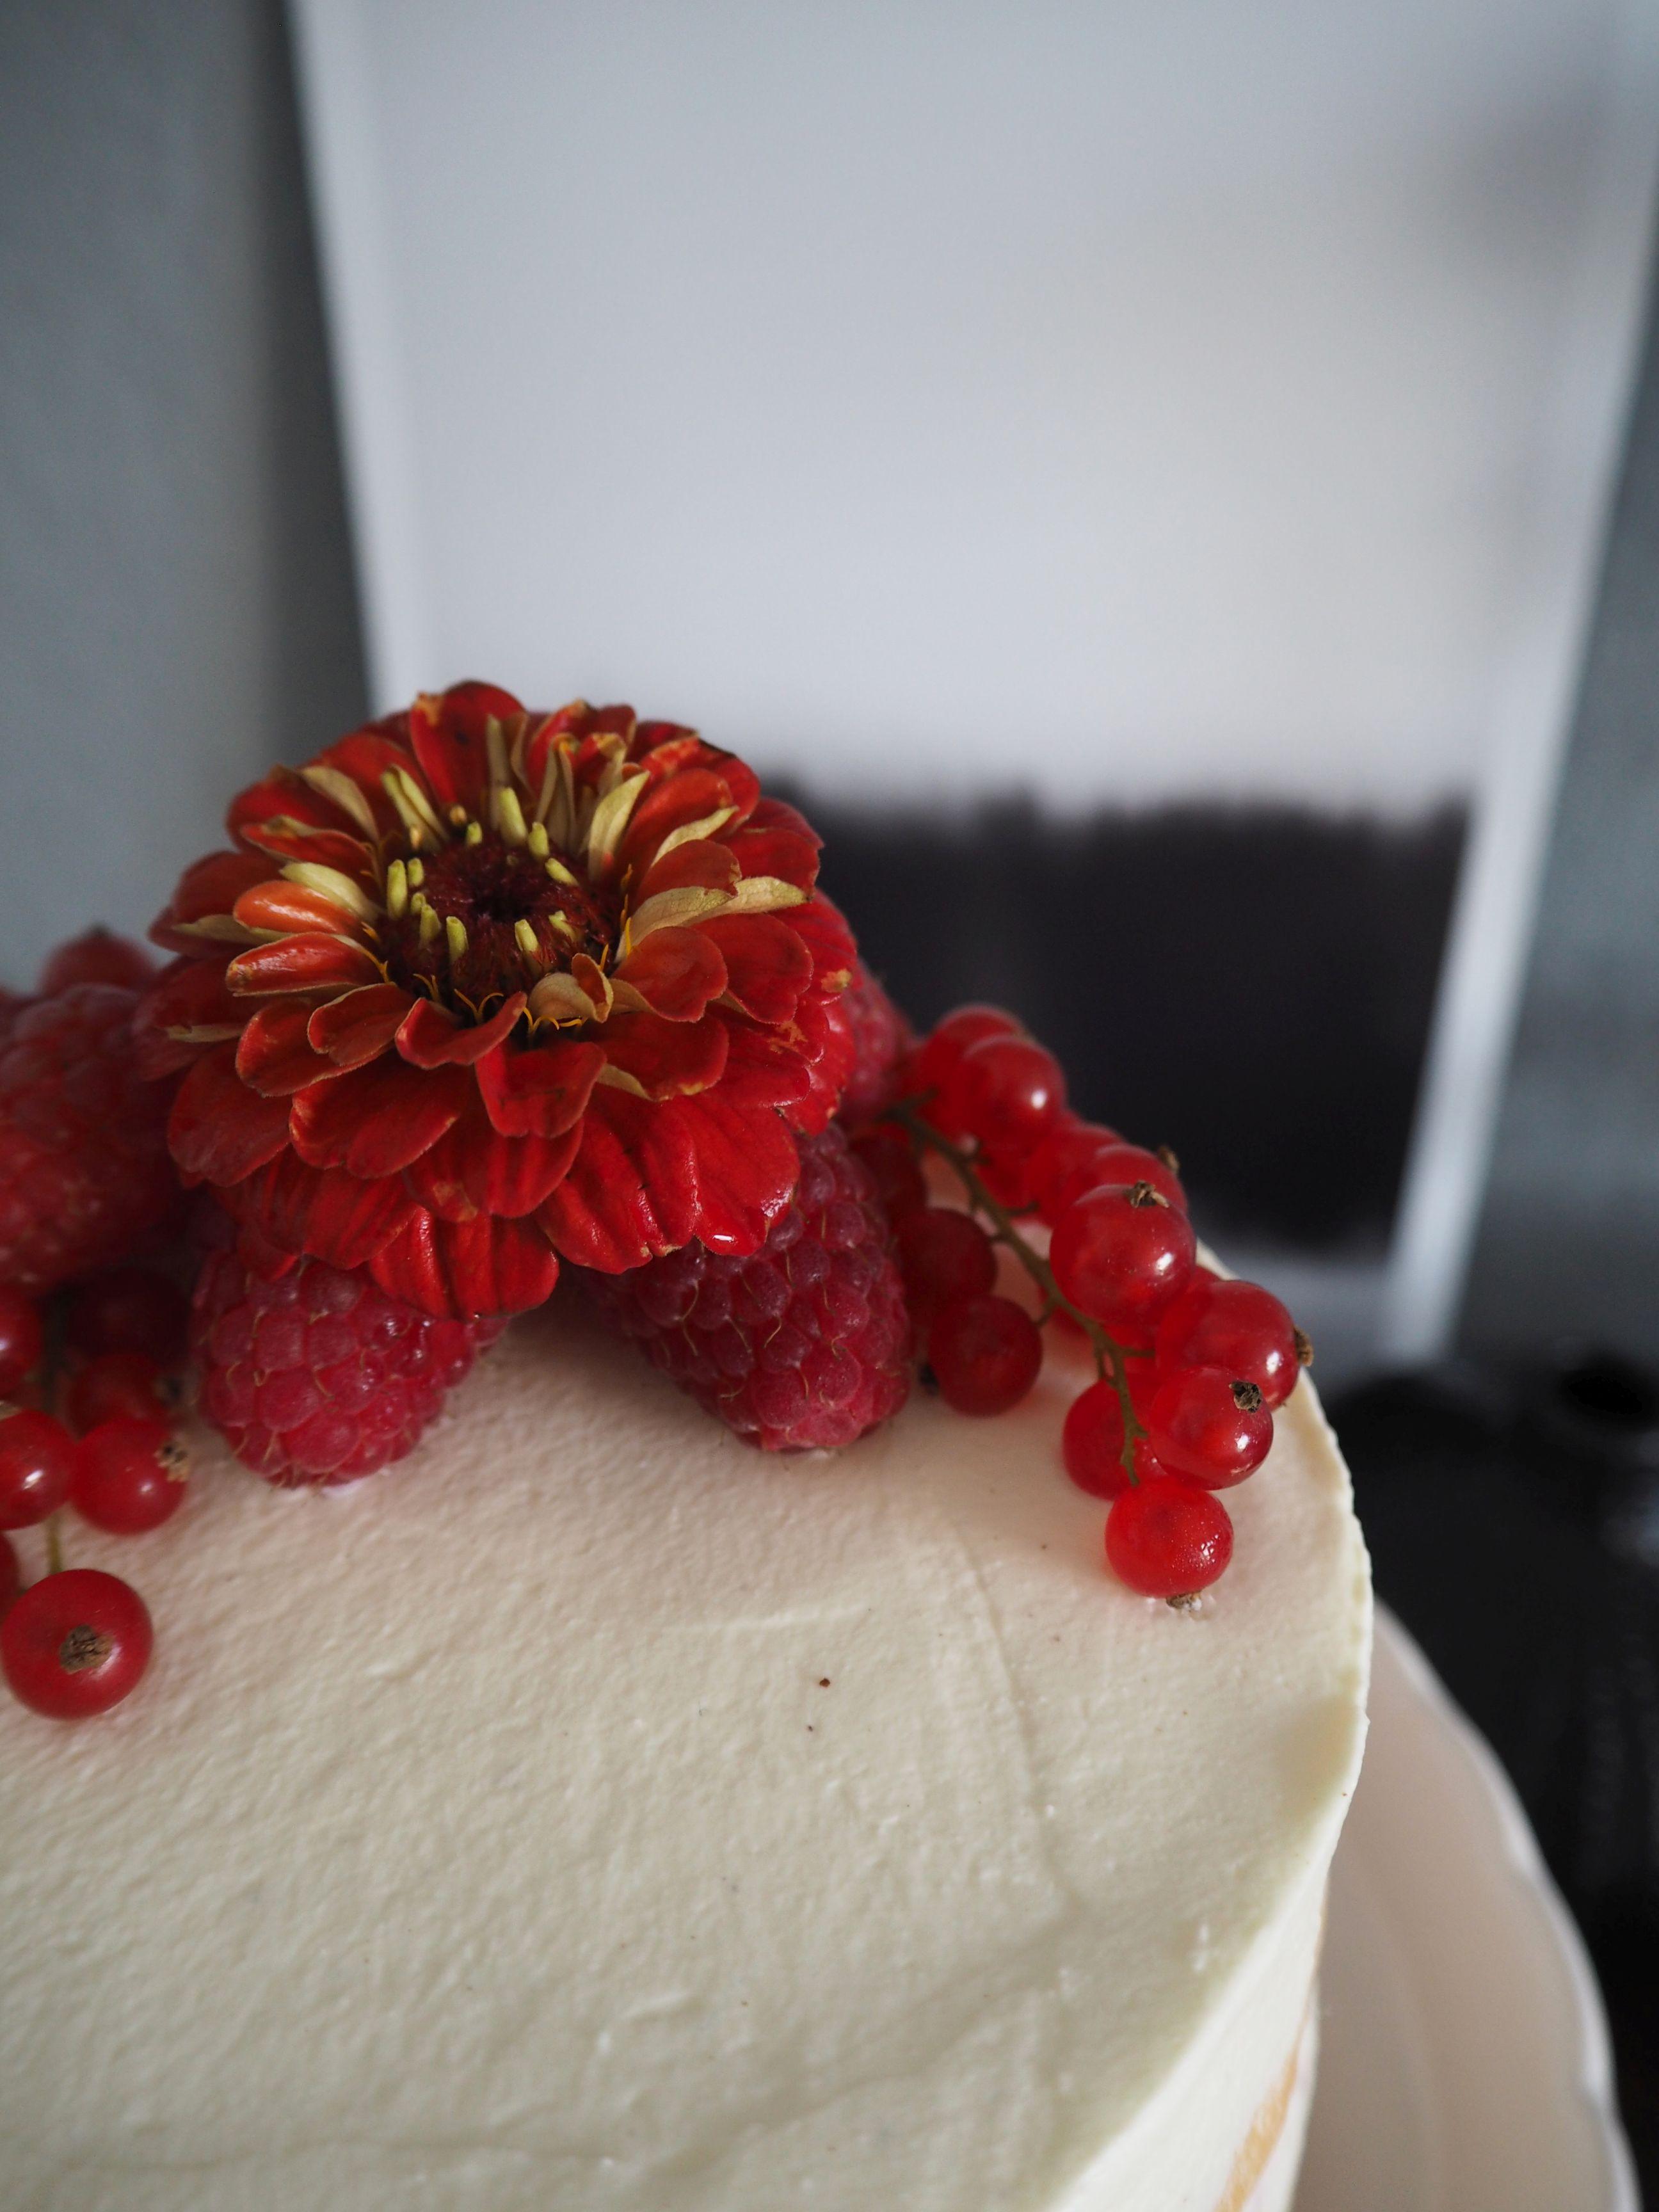 2018-05-skoen-och-kreativ-foodberry-semi-naked-cake-beeren-torte-zum-muttertag (7)